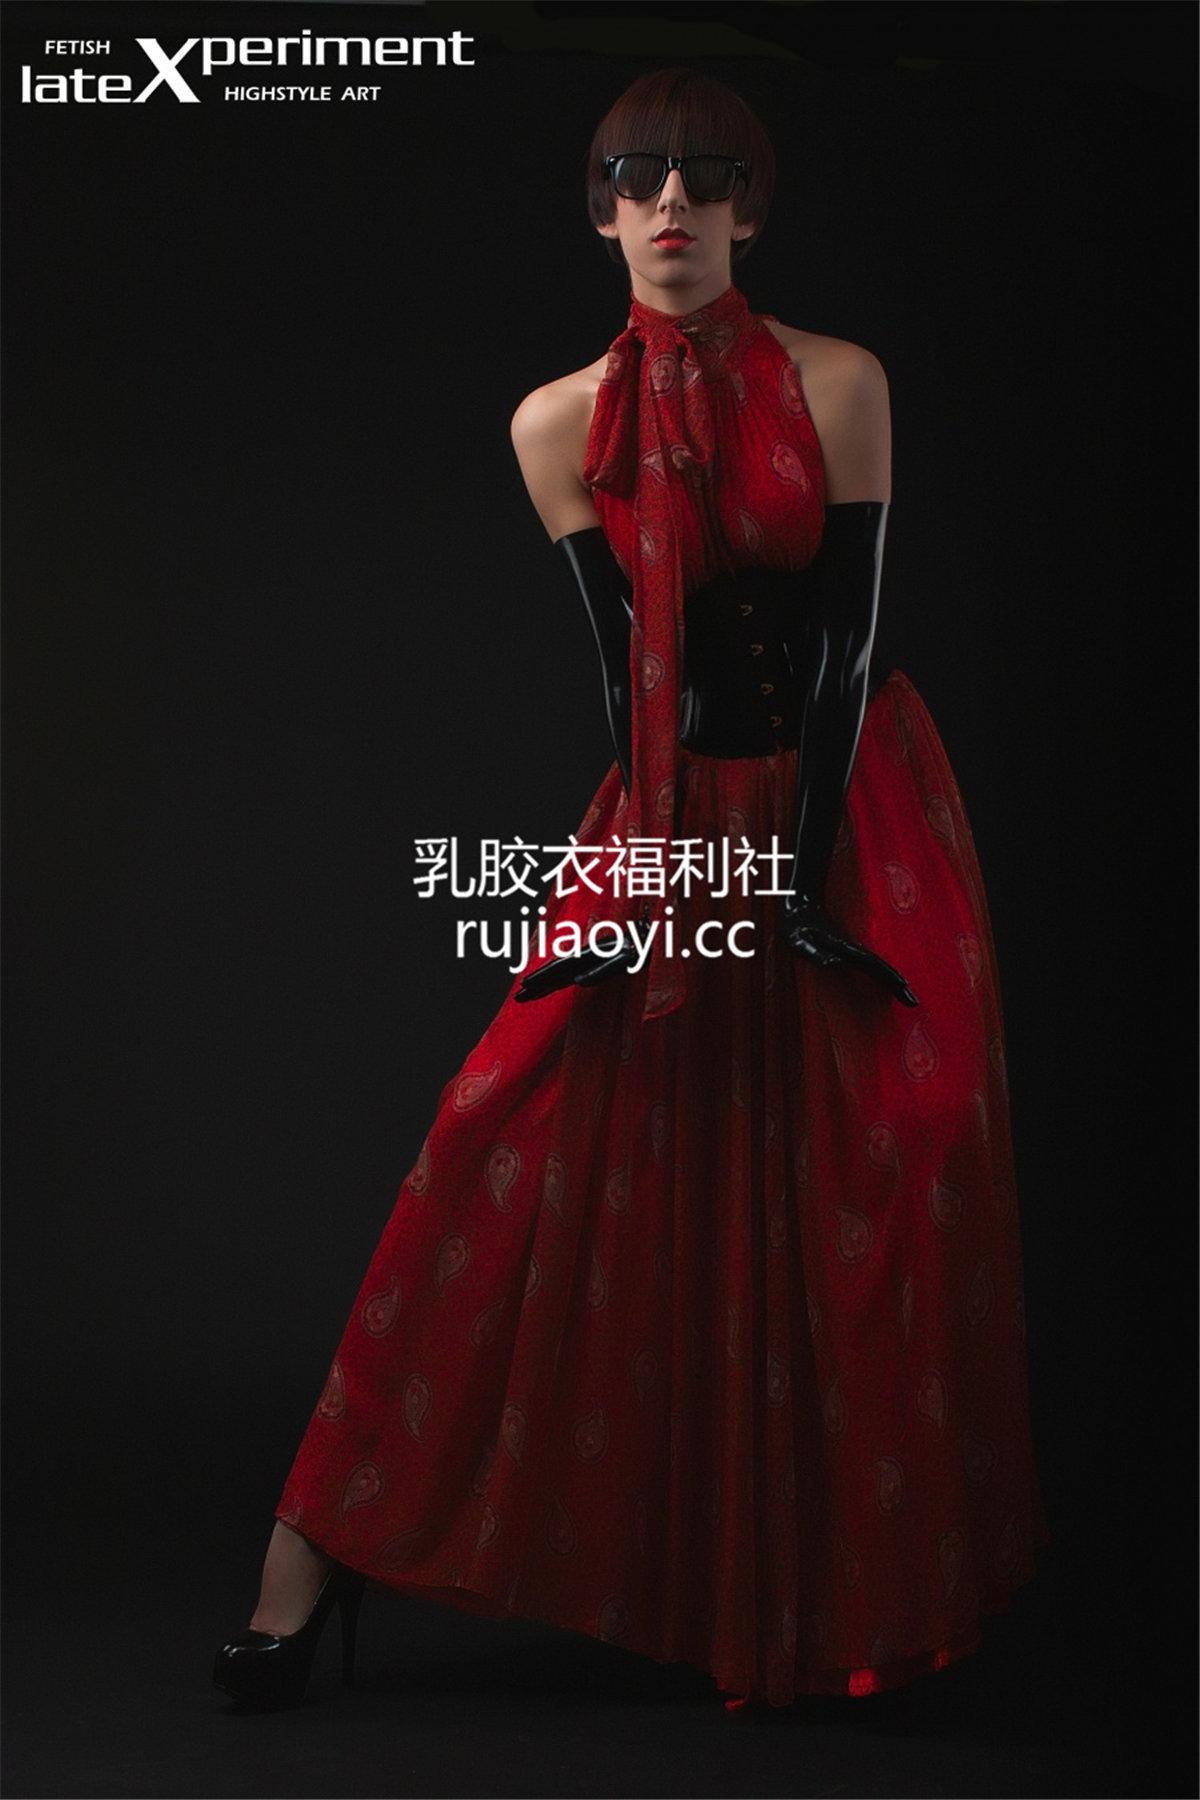 [LateXperiment] 人体艺术乳胶衣模特写真